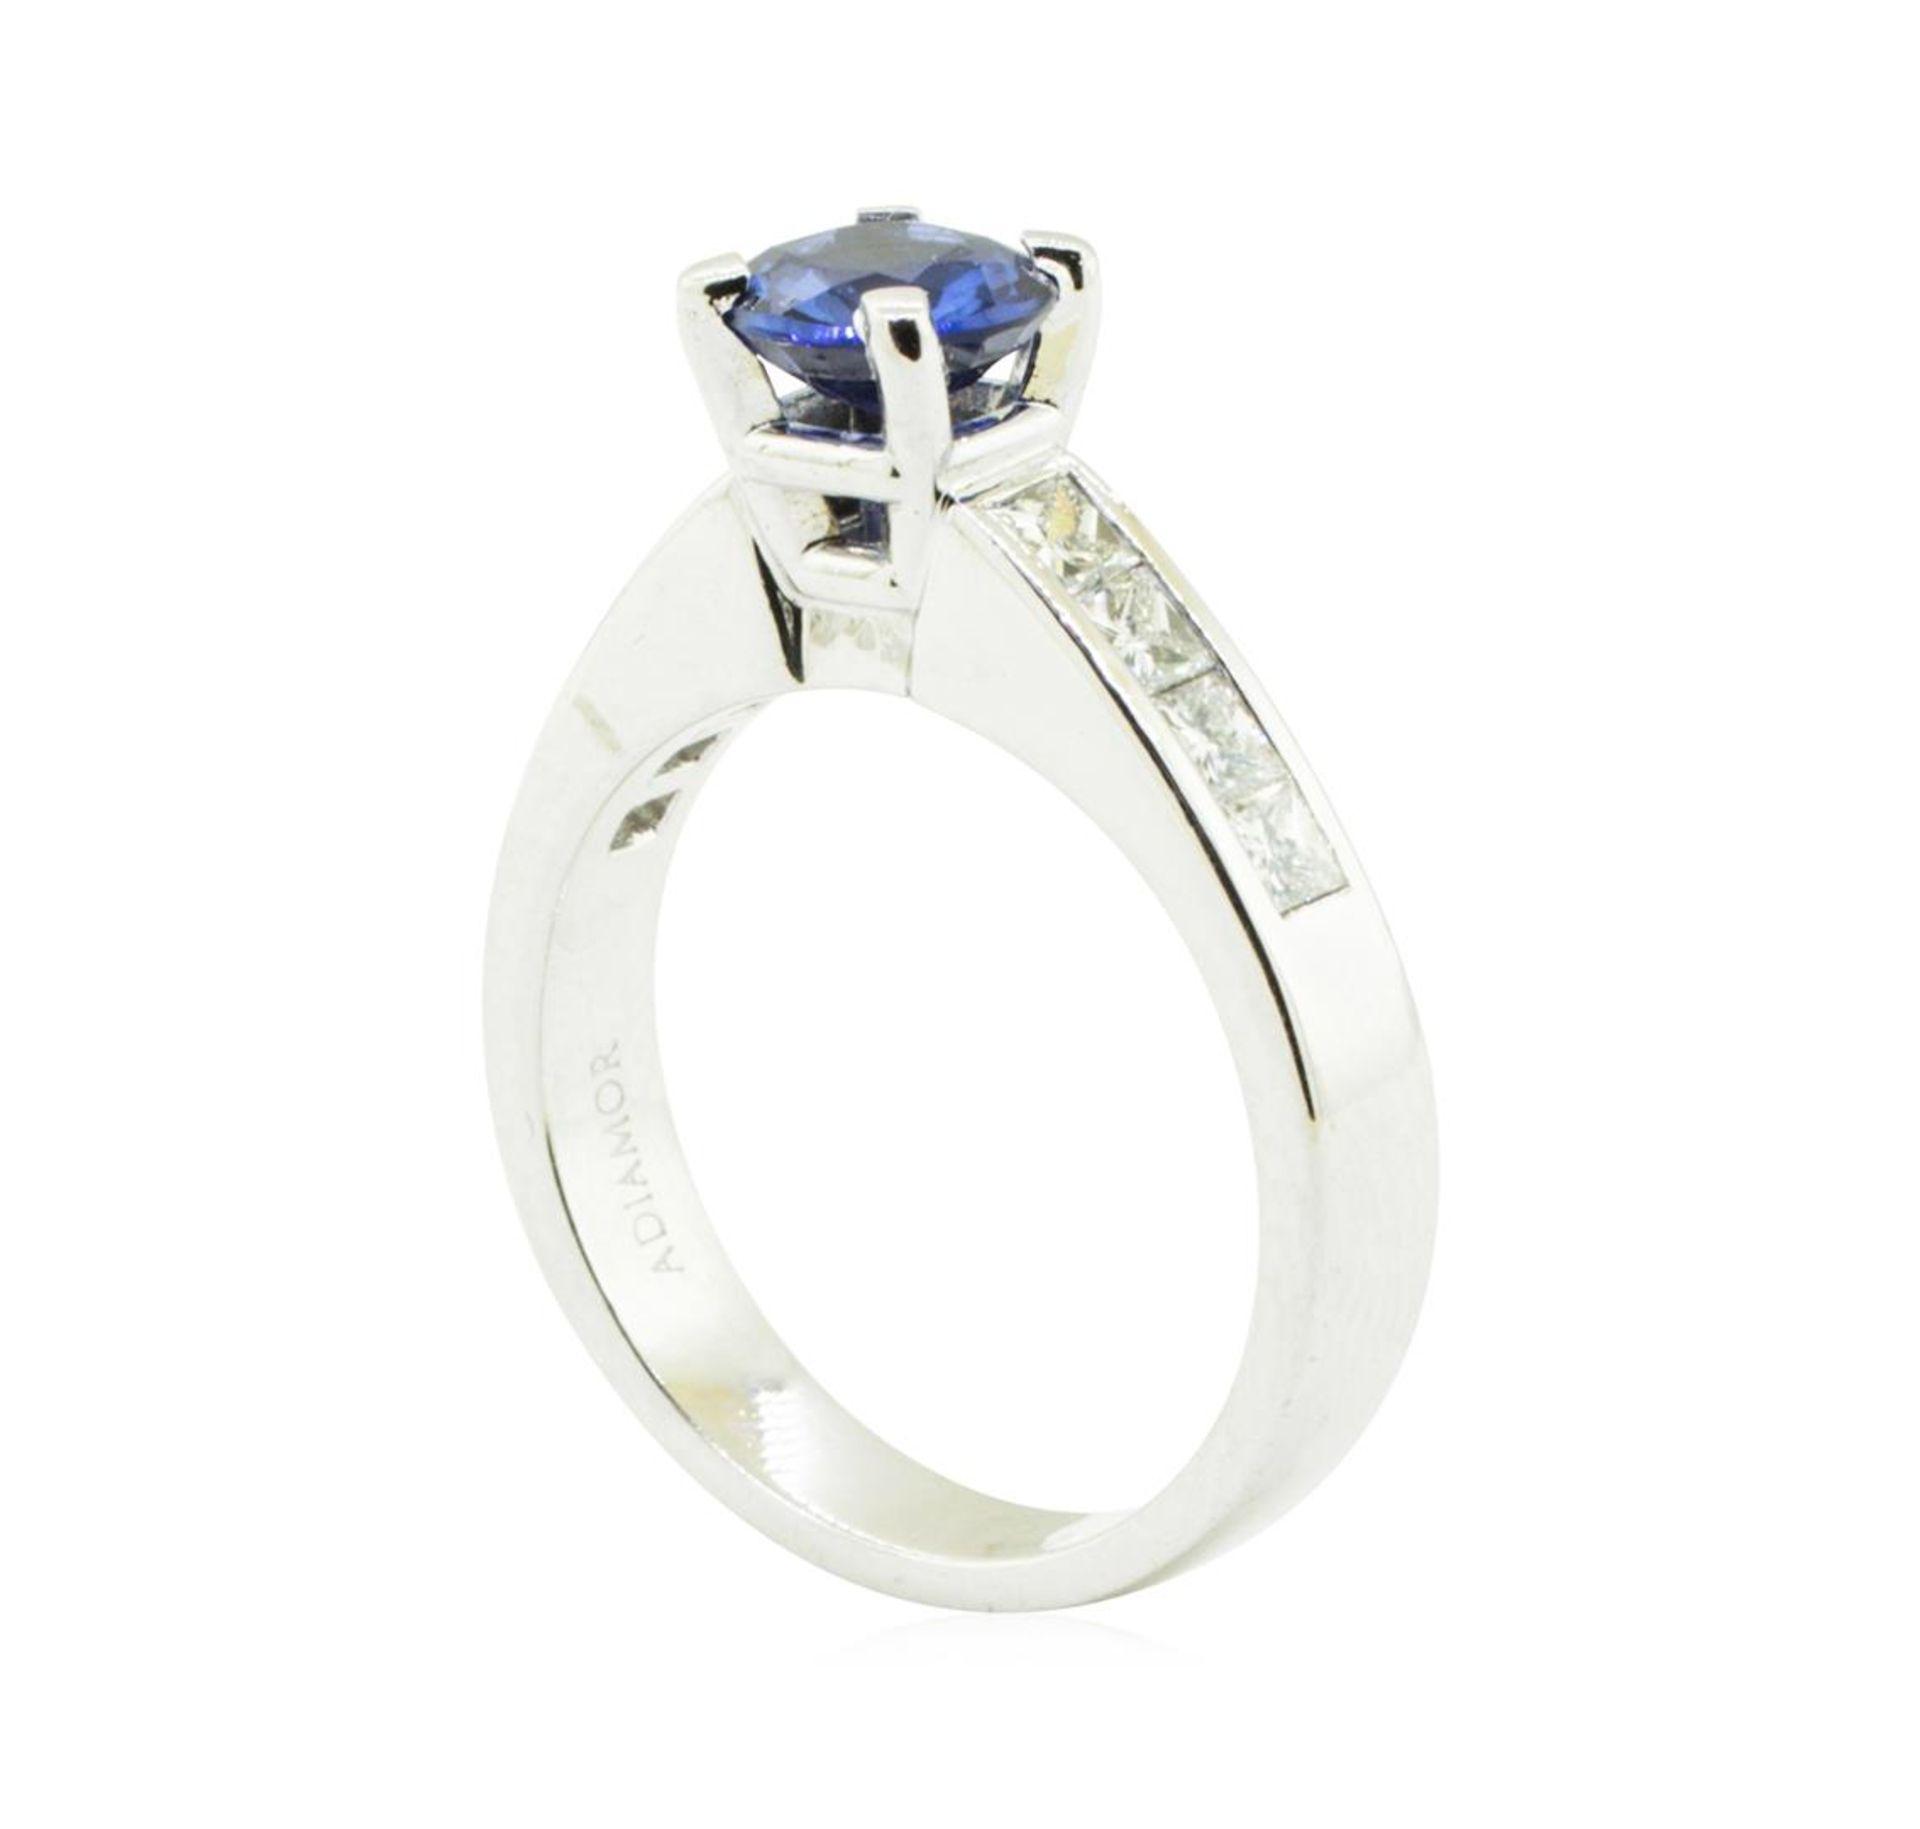 2.01 ctw Round Mixed Blue Sapphire And Diamond Ring - Platinum - Image 4 of 5